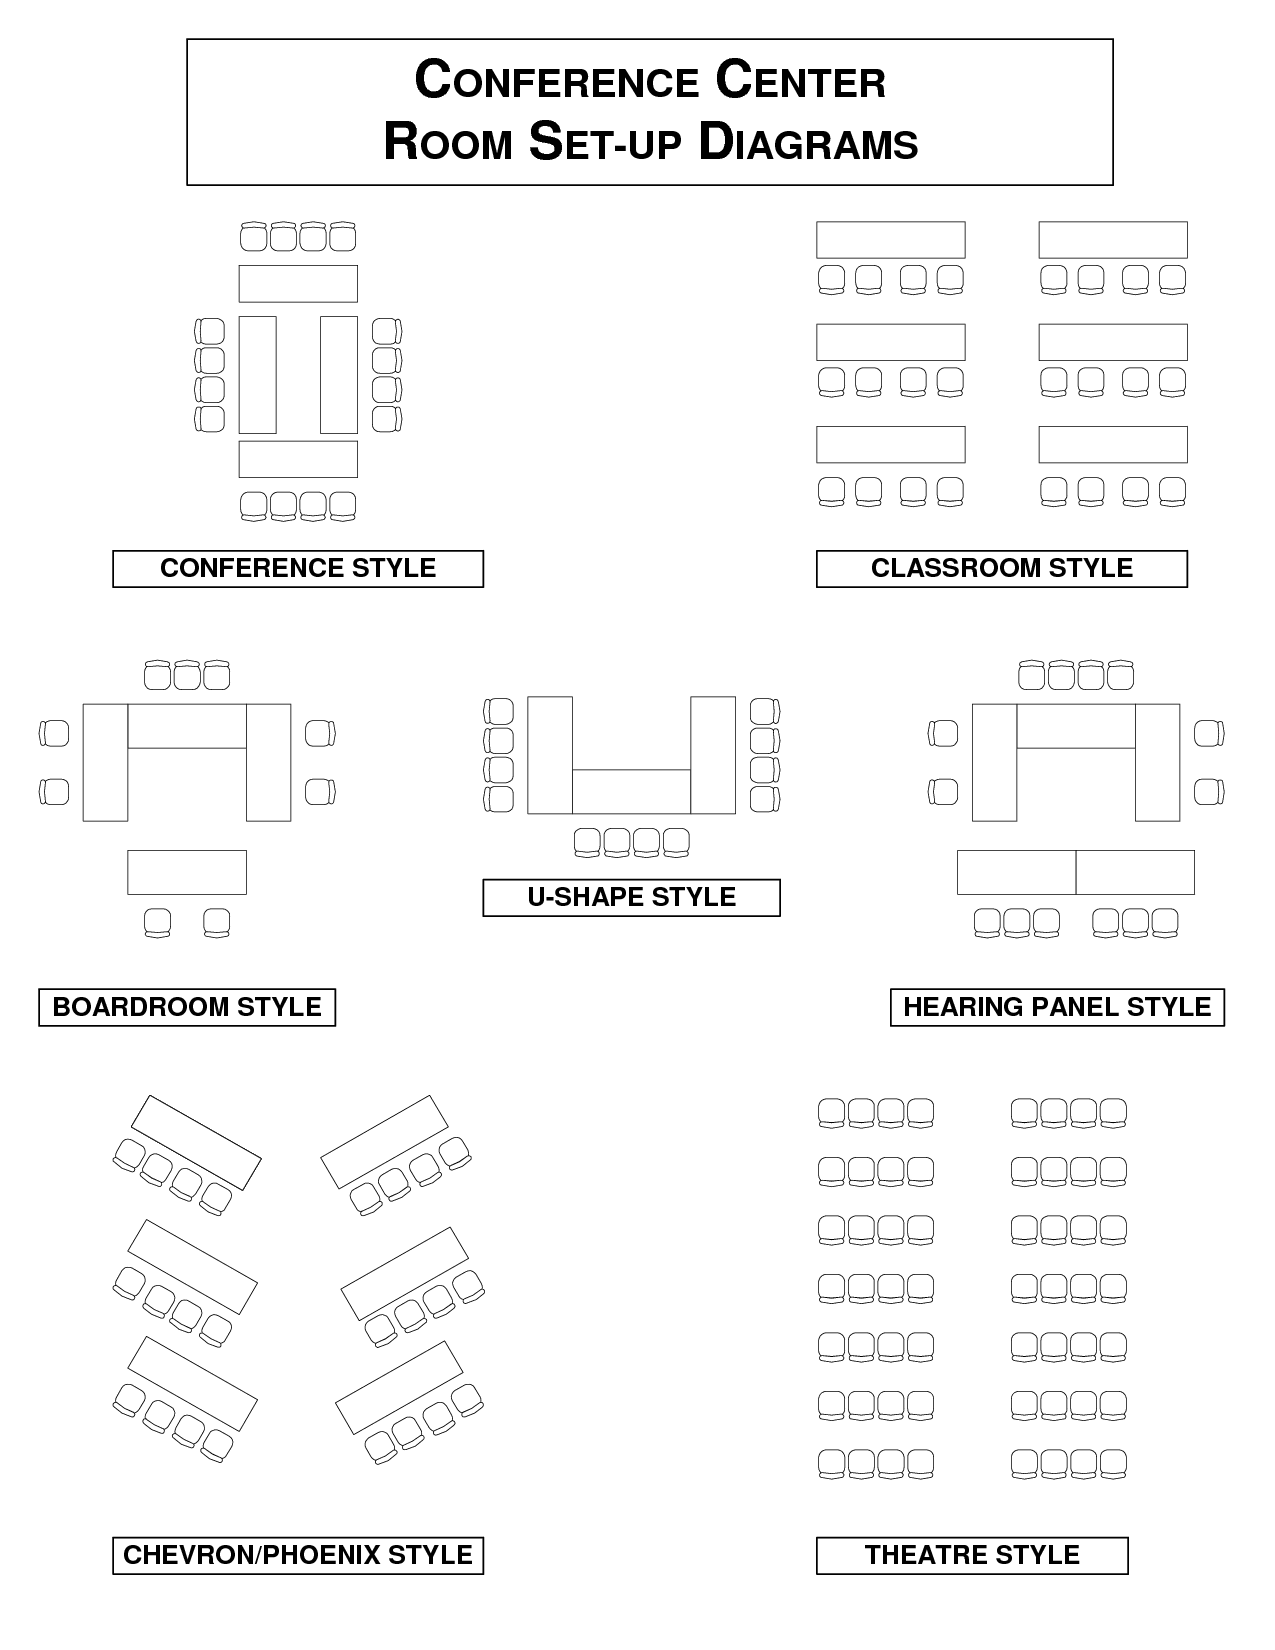 Room Setup Diagram 2002 Nissan Xterra Car Stereo Wiring Conference Meeting Set Up Diagrams Sancm Banquets